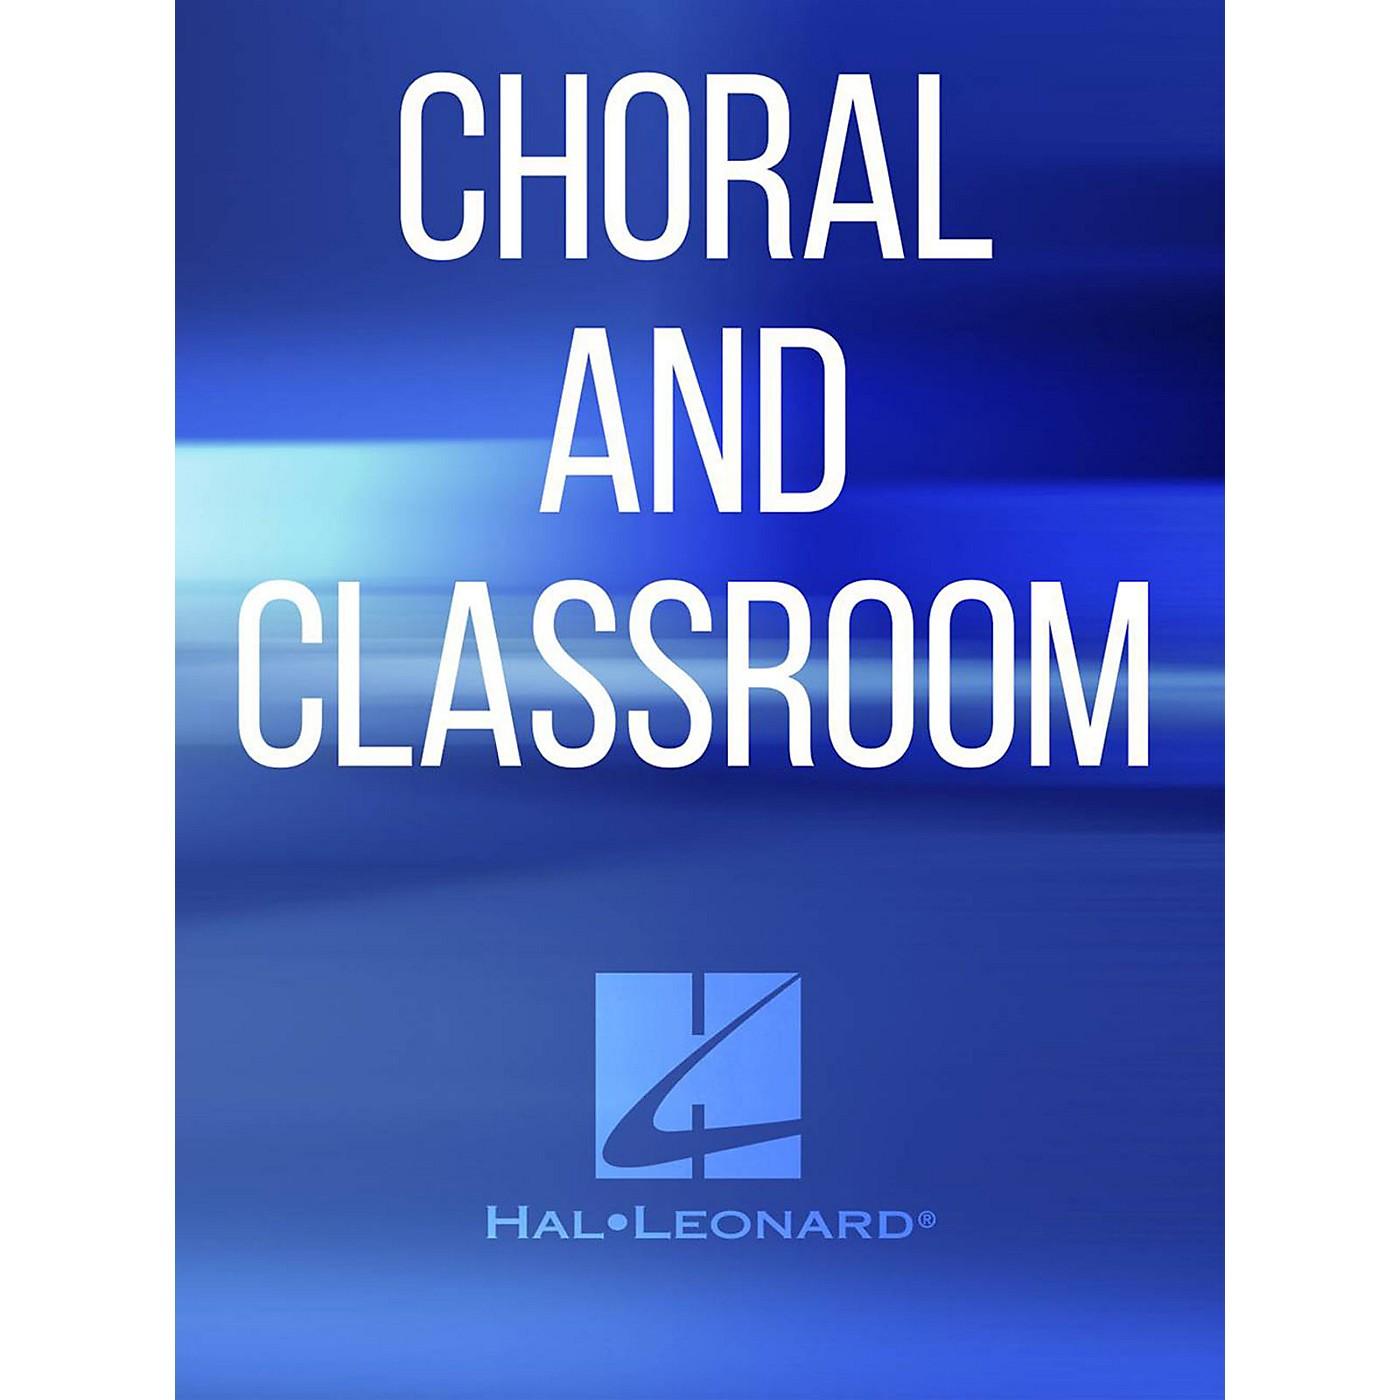 Hal Leonard Joyful Day SATB Composed by Jay Crenshaw Decker thumbnail